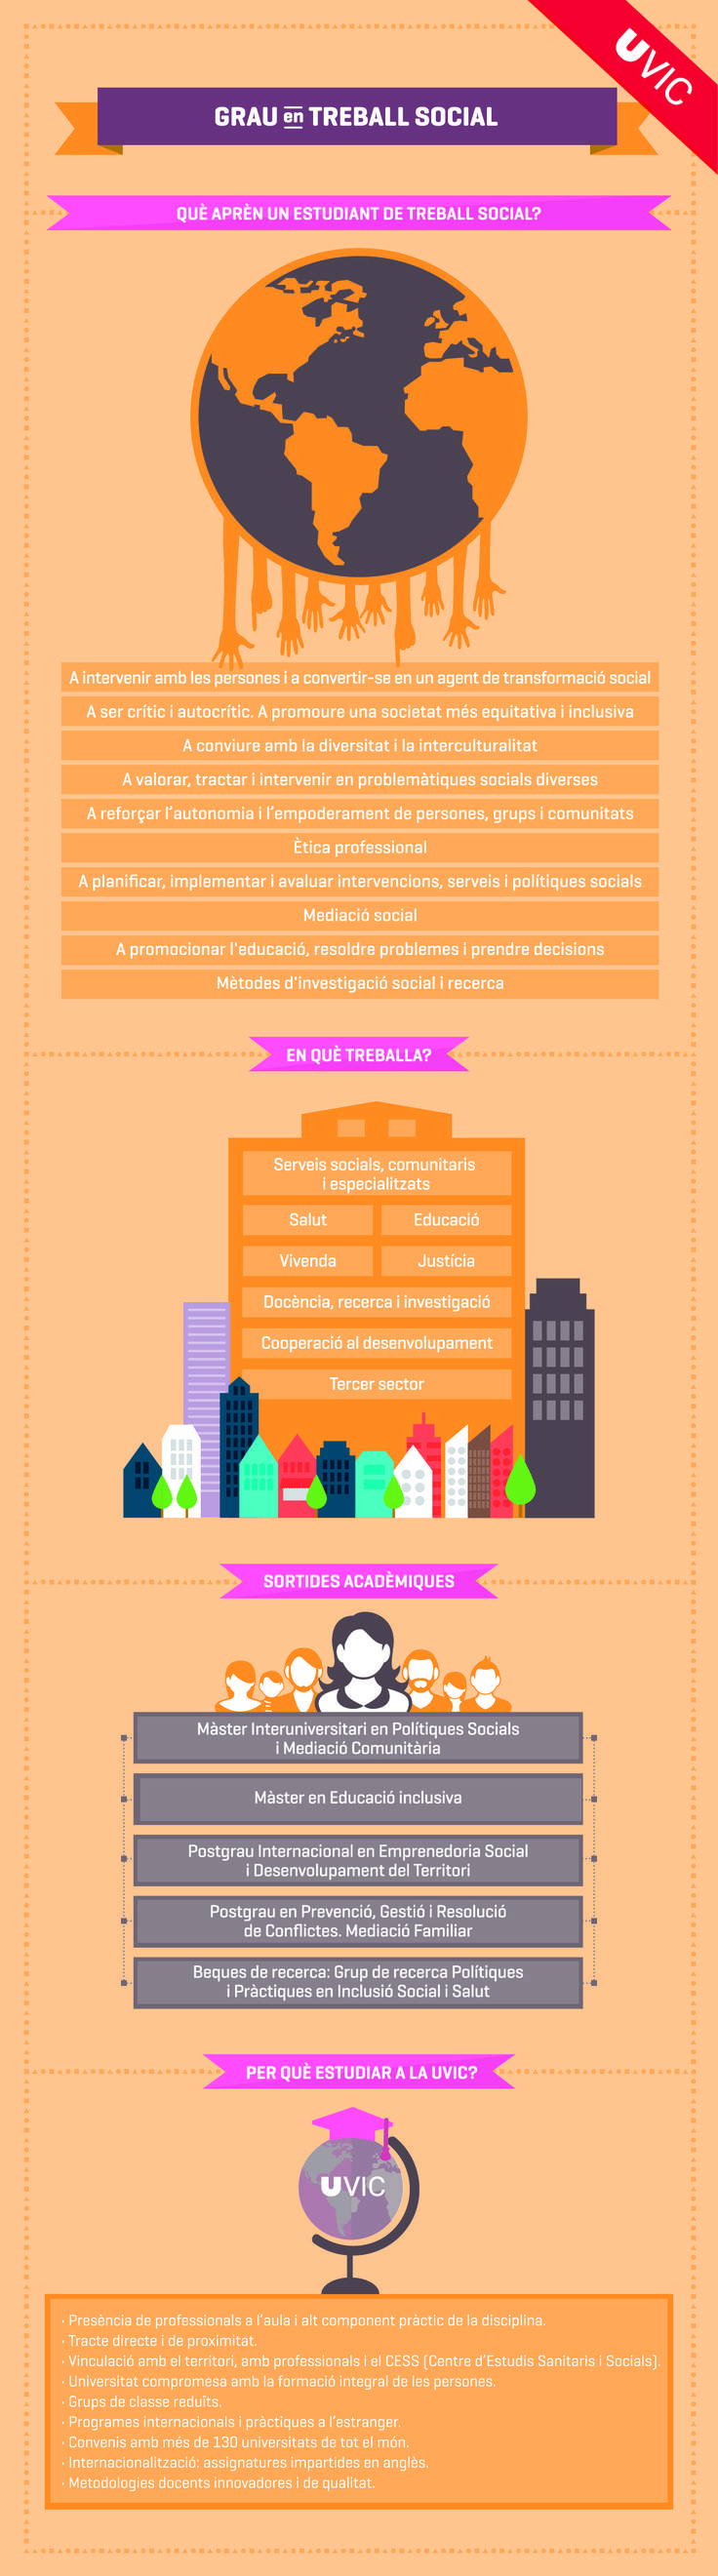 Infografia del Grau en Treball Social. #grau #graus #TreballSocial #infografia #estudis #universitat #uviclife #uvic #universitatdevic